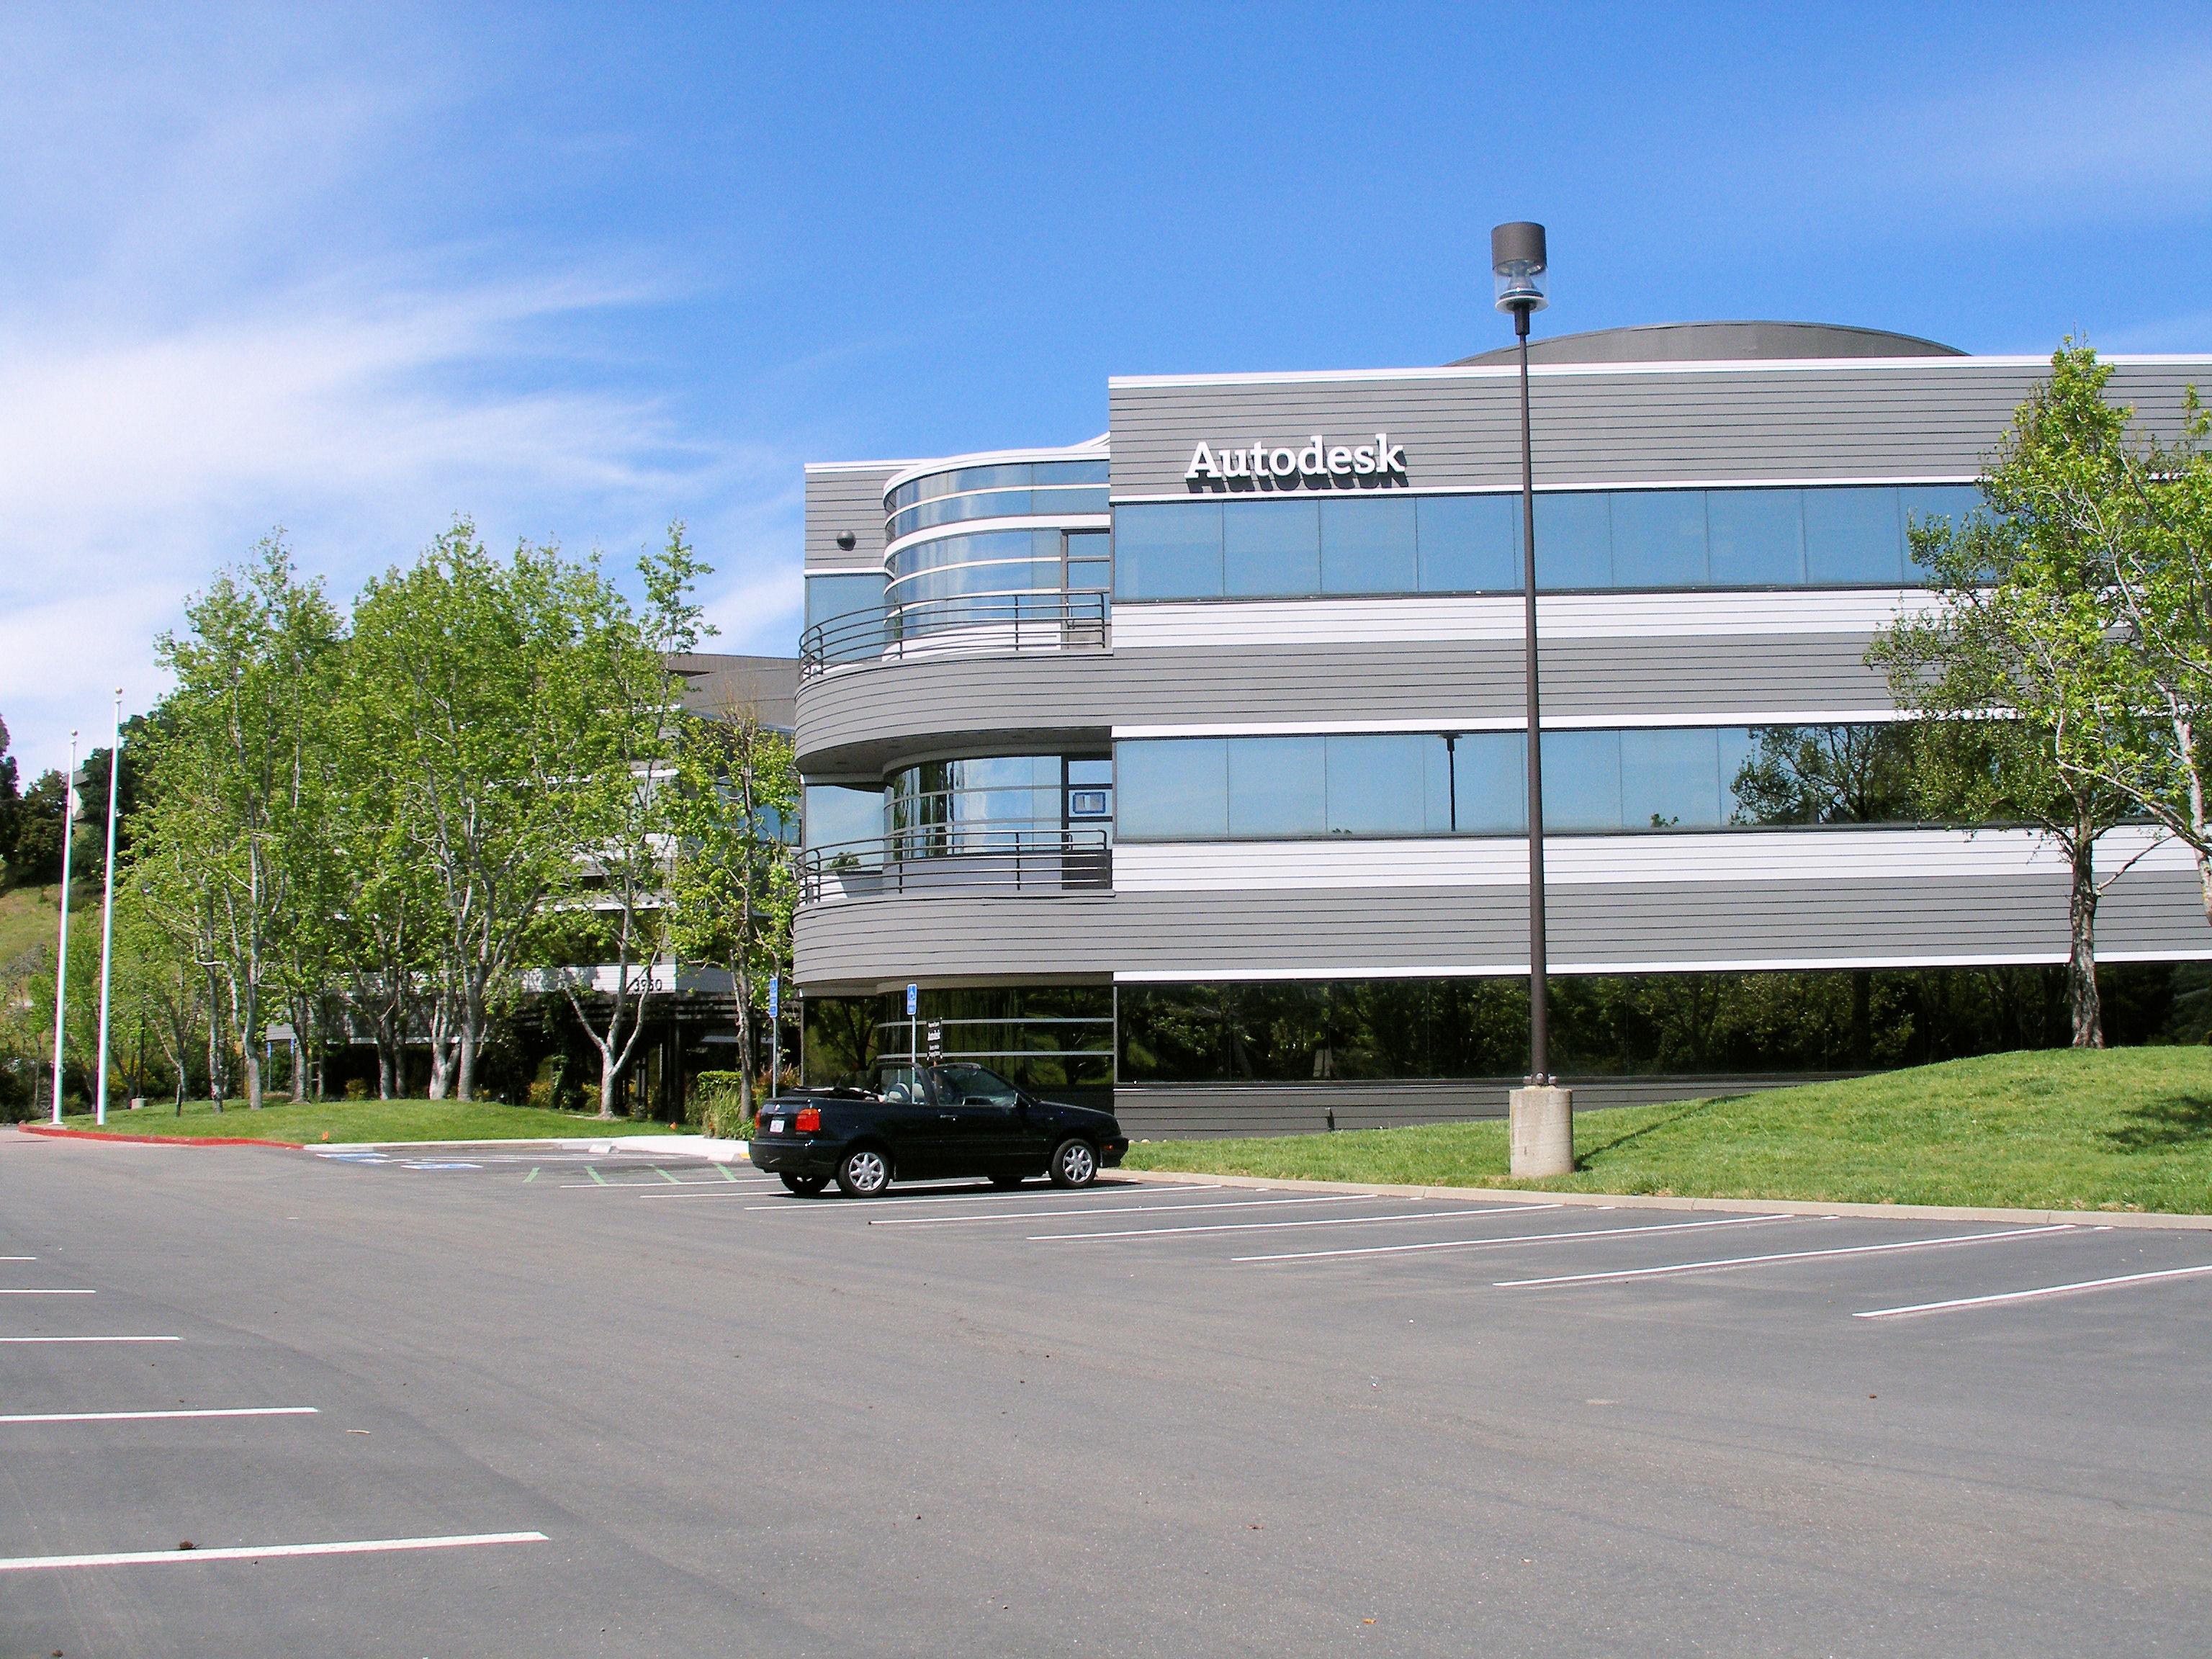 File:Autodesk headquarters.jpg - Wikipedia